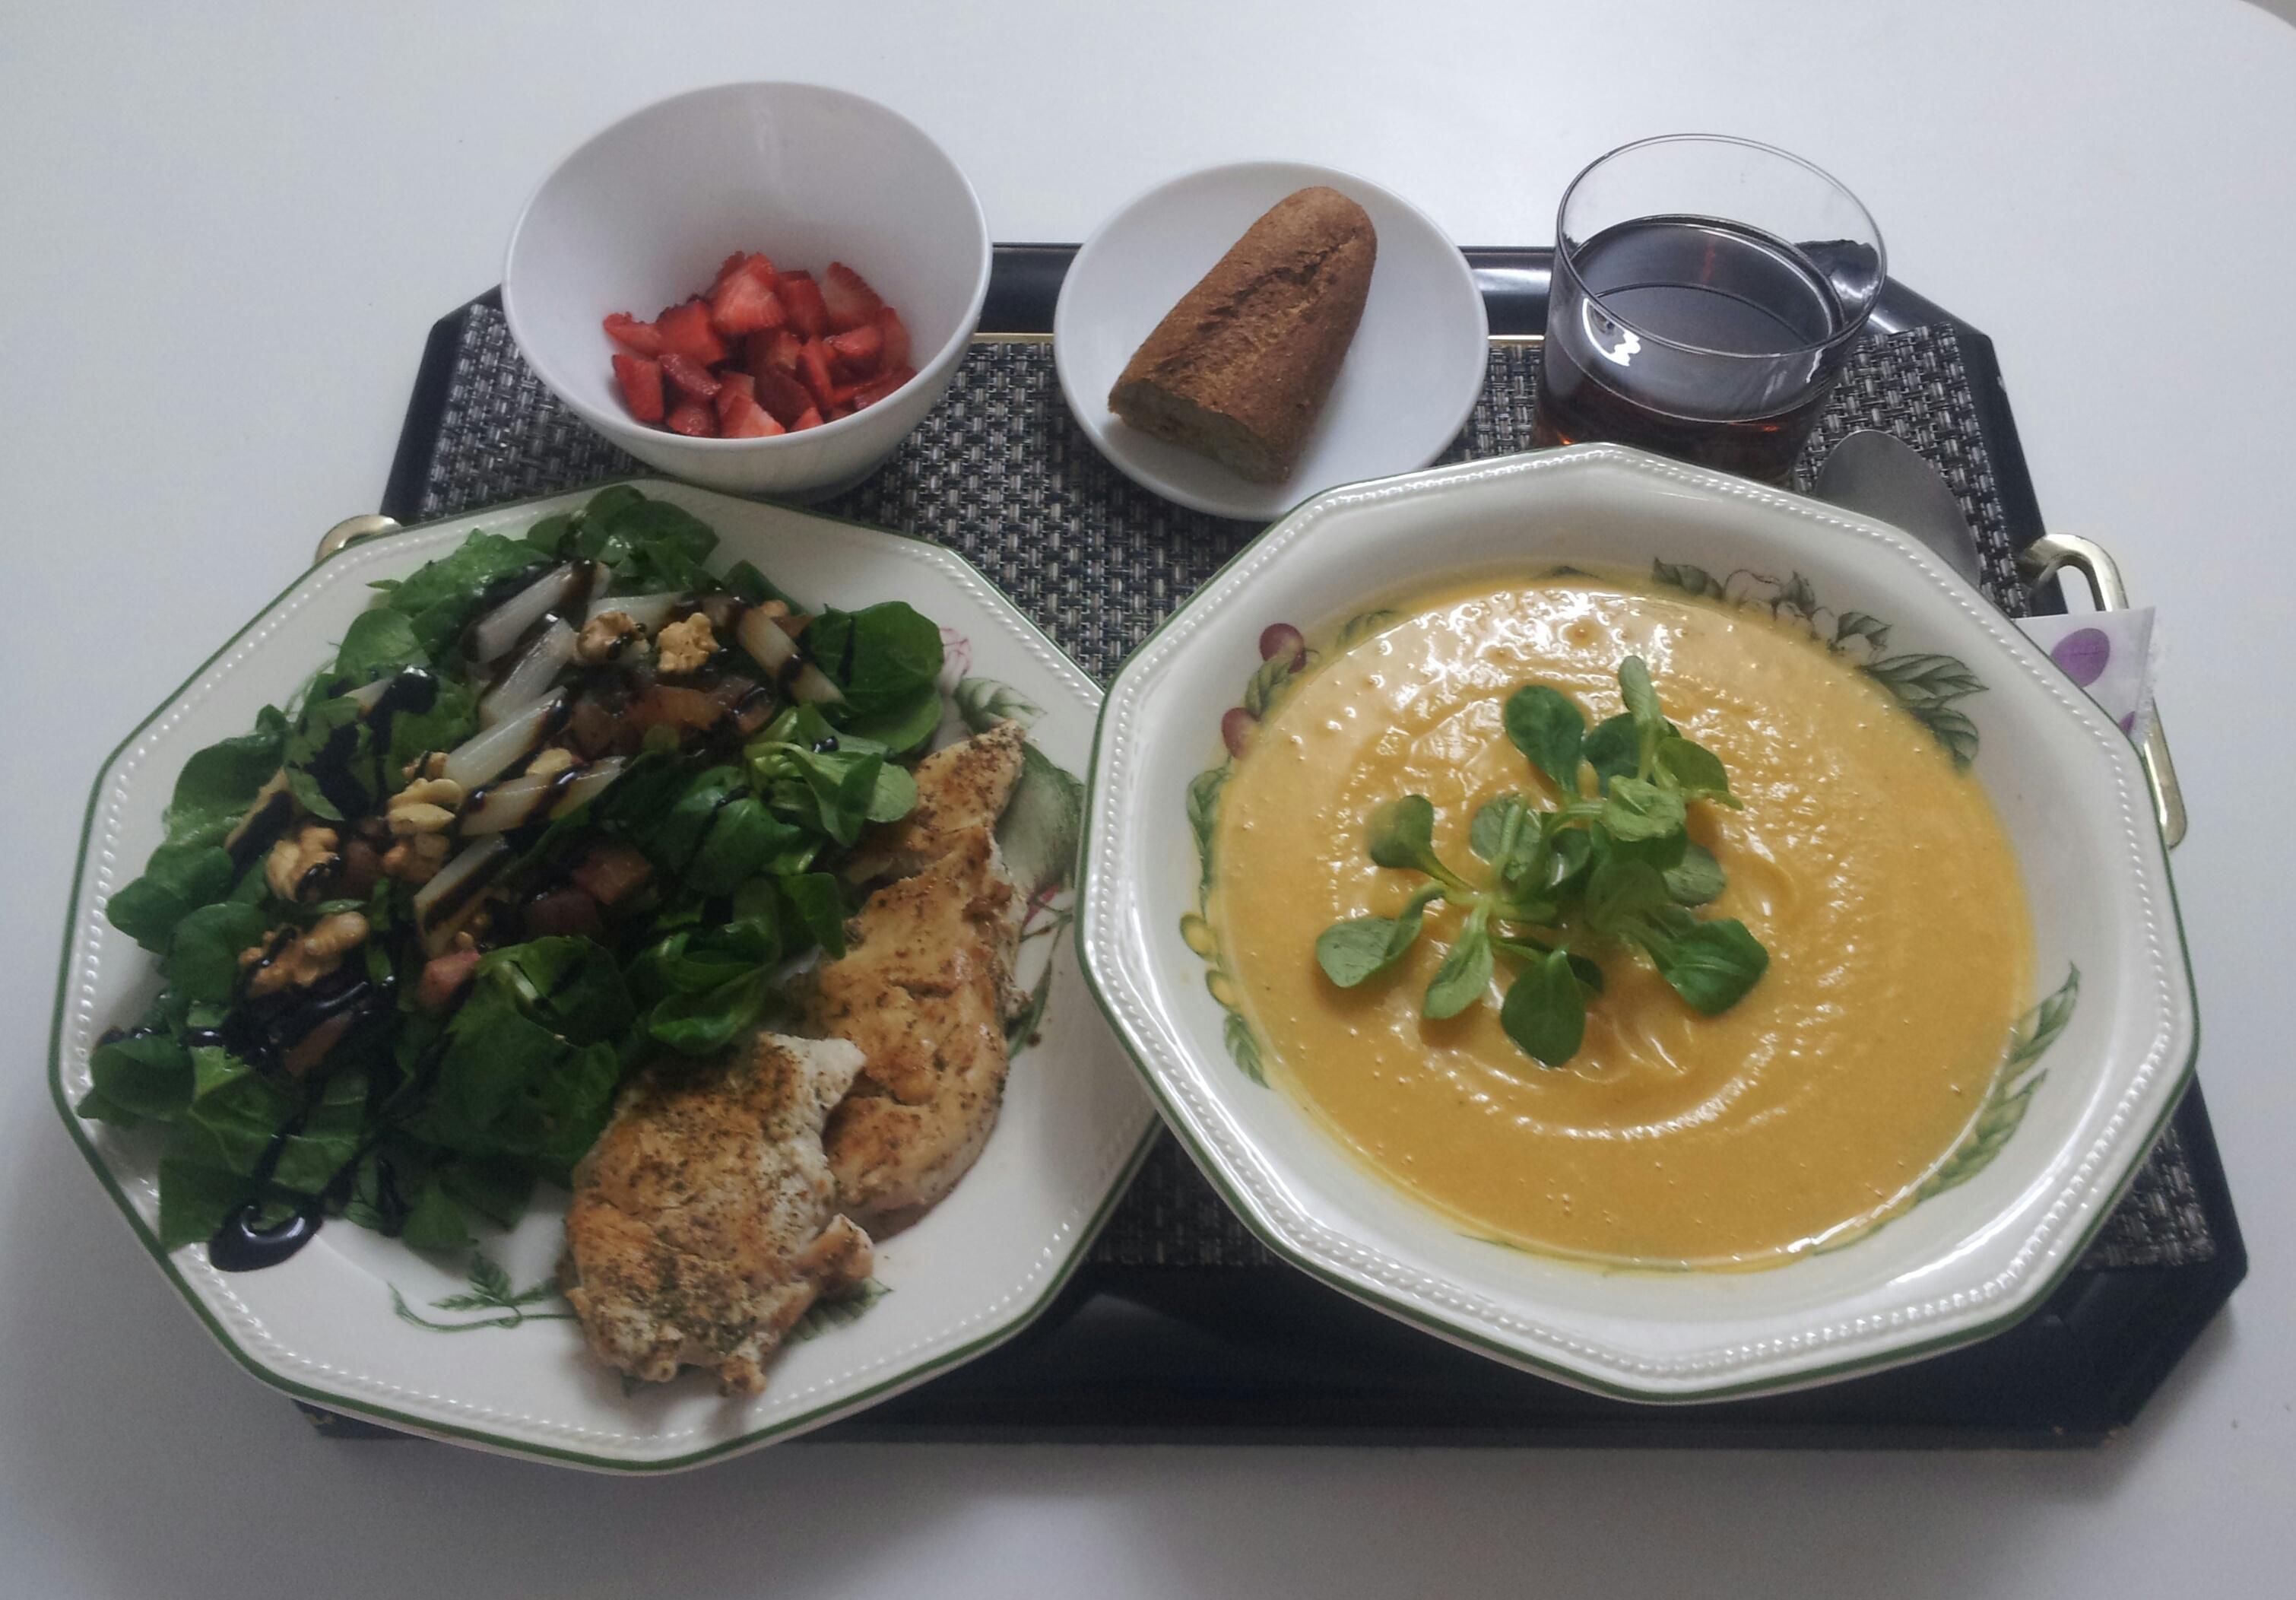 Comida sana for Comidas rapidas y sanas